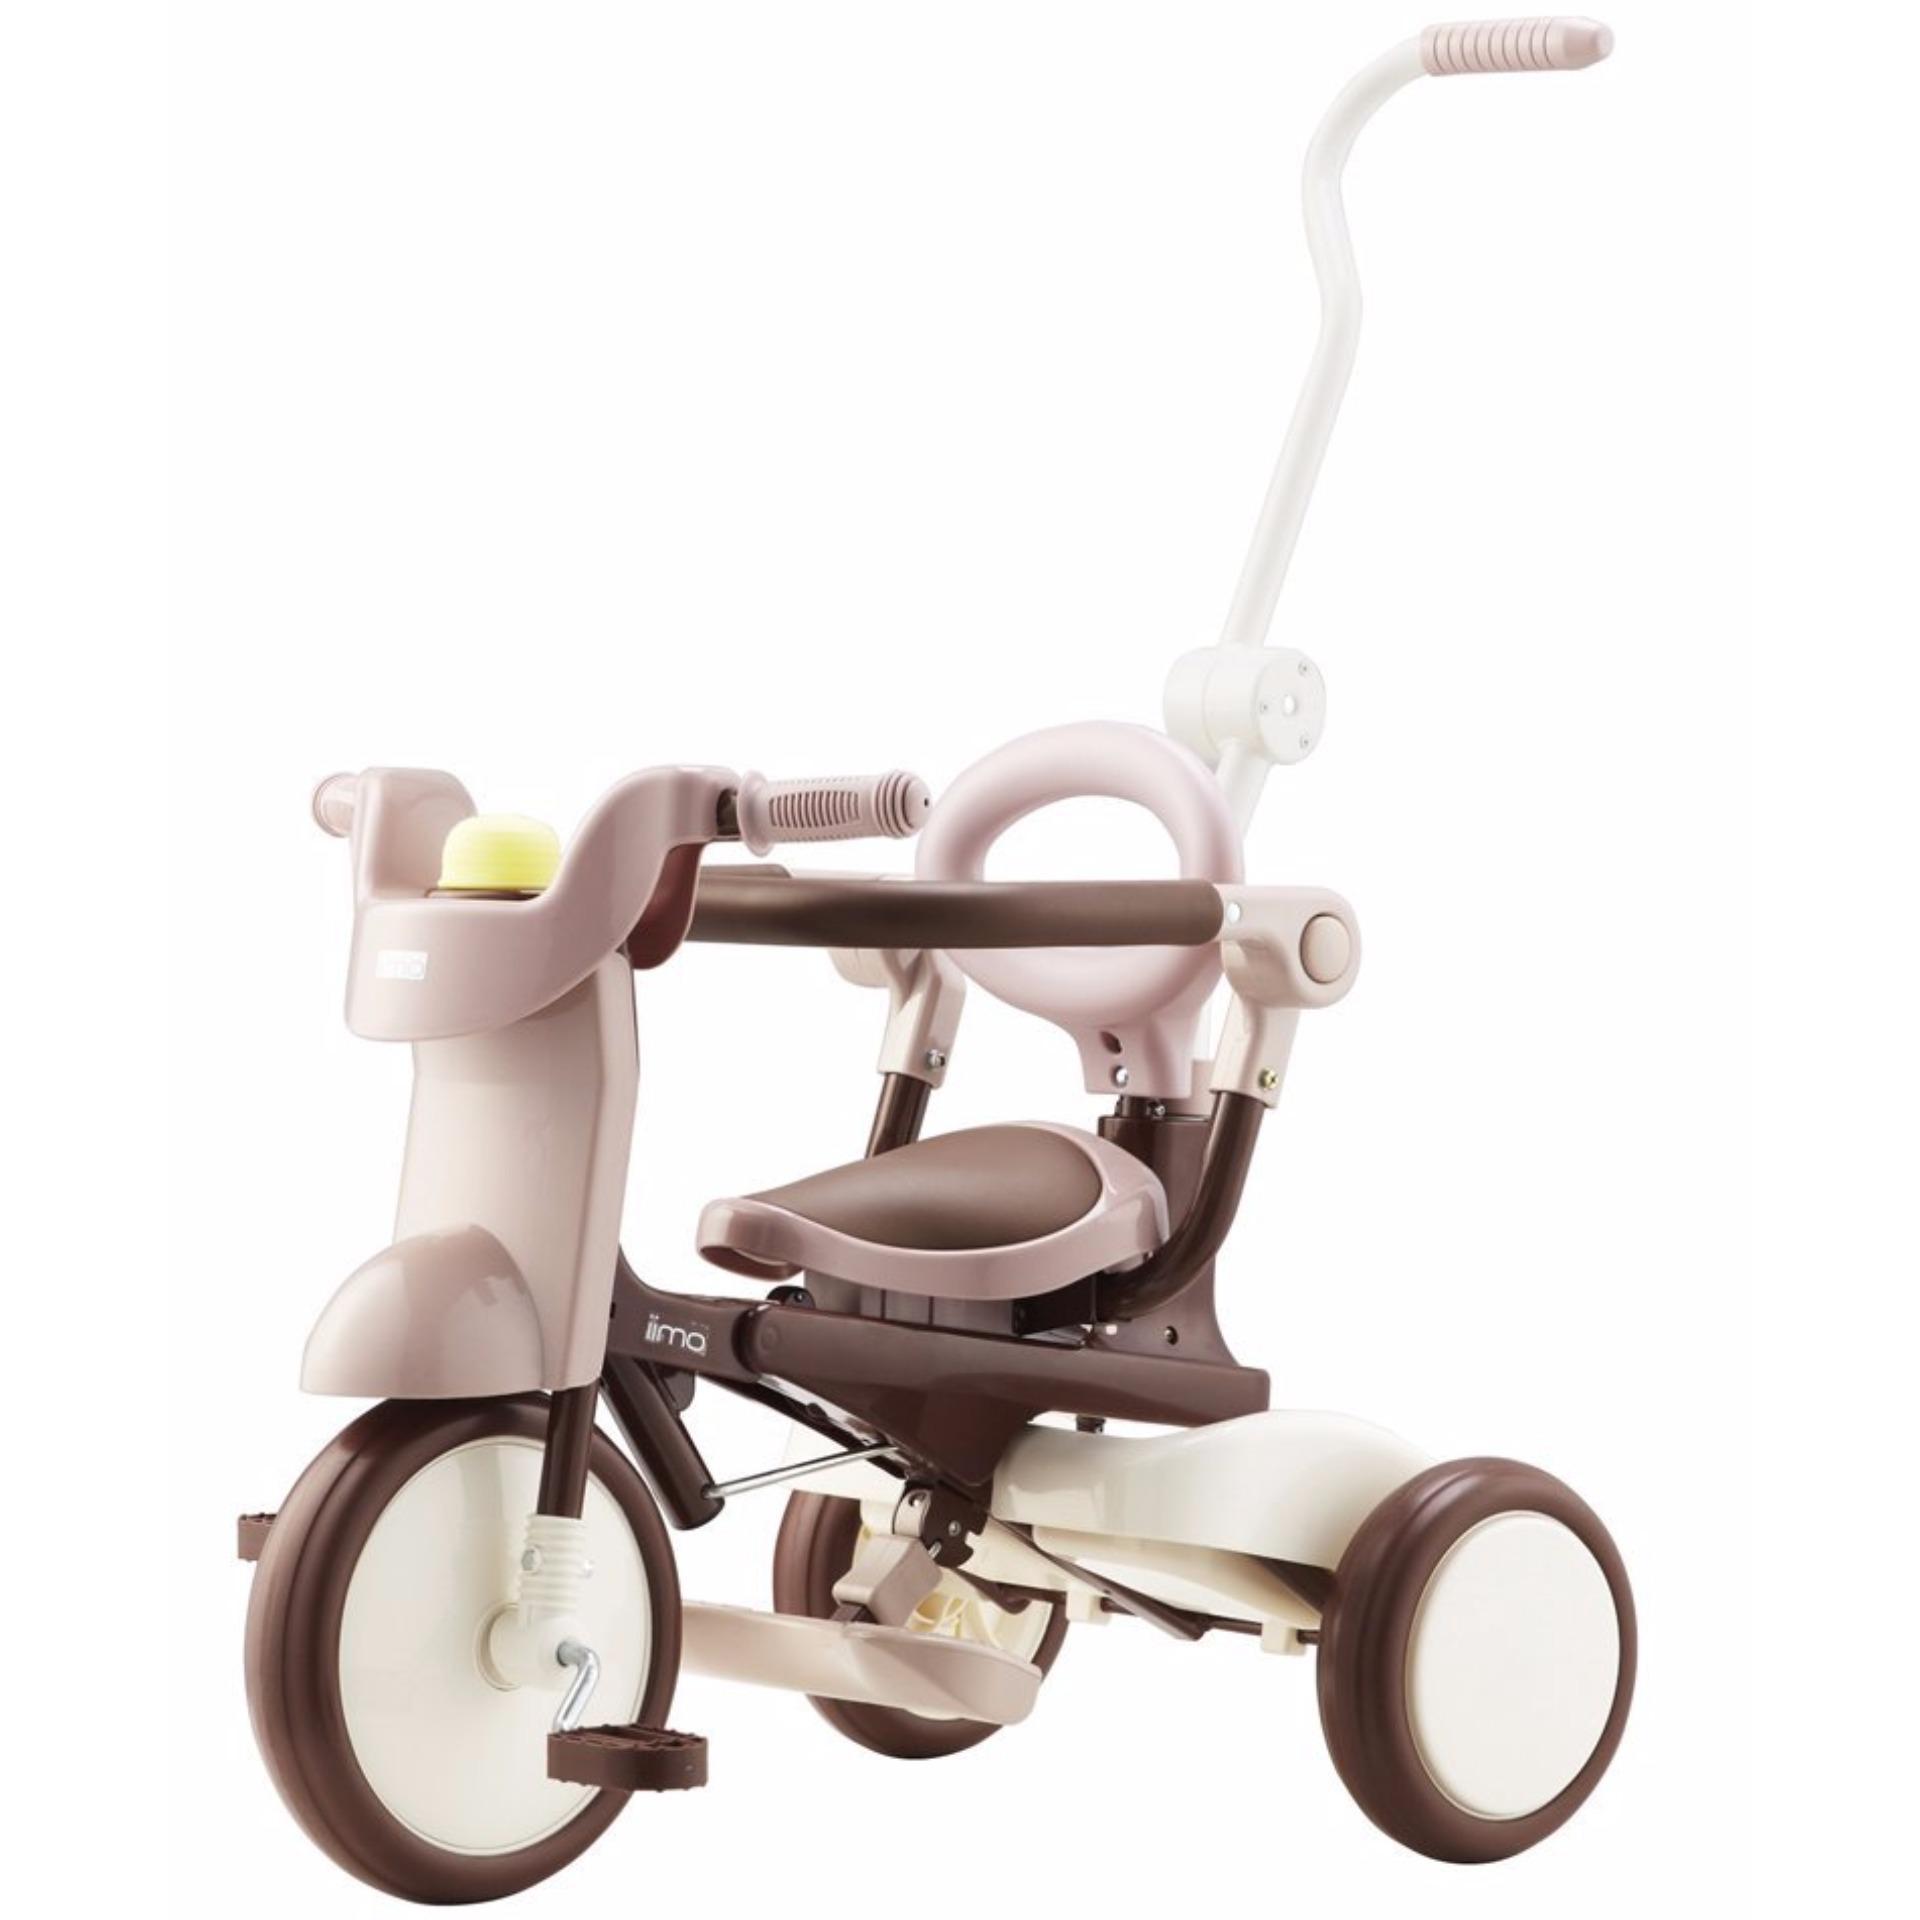 iimo 3-in-1 Foldable Tricycle #2 - Comfort Brown | Lazada Singapore